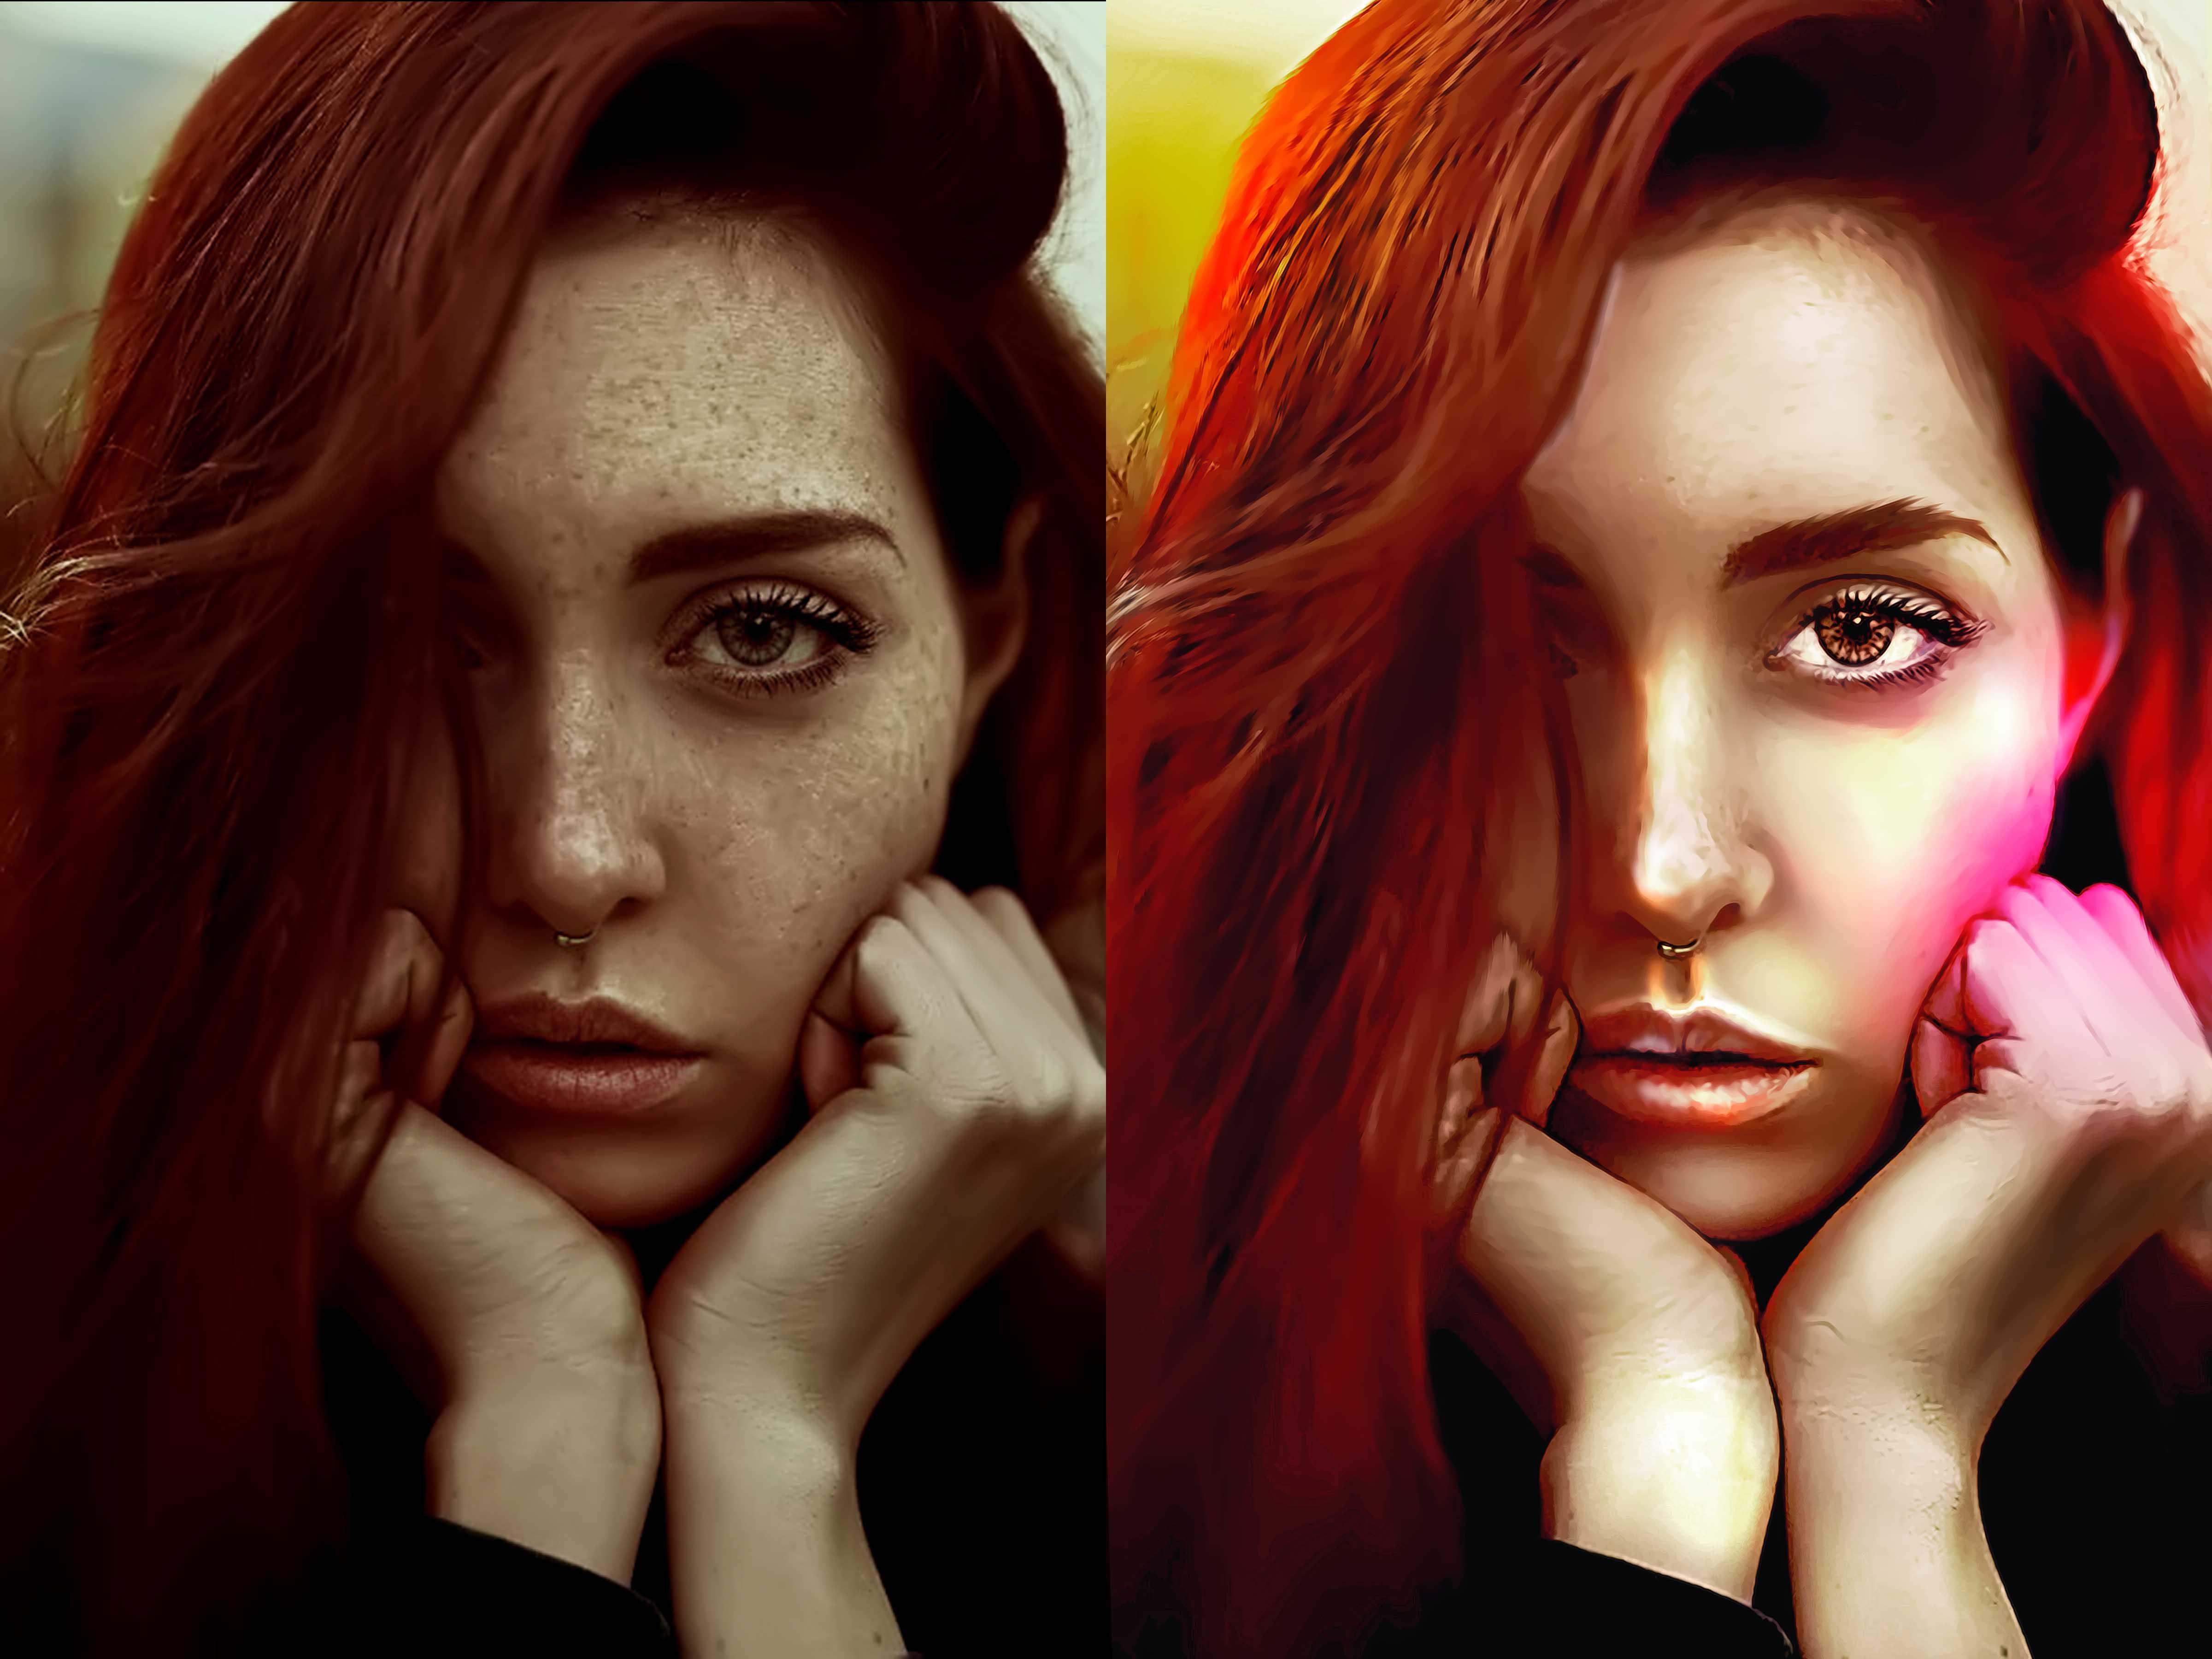 Convert your photo into digital painting by lokeshsuthar27